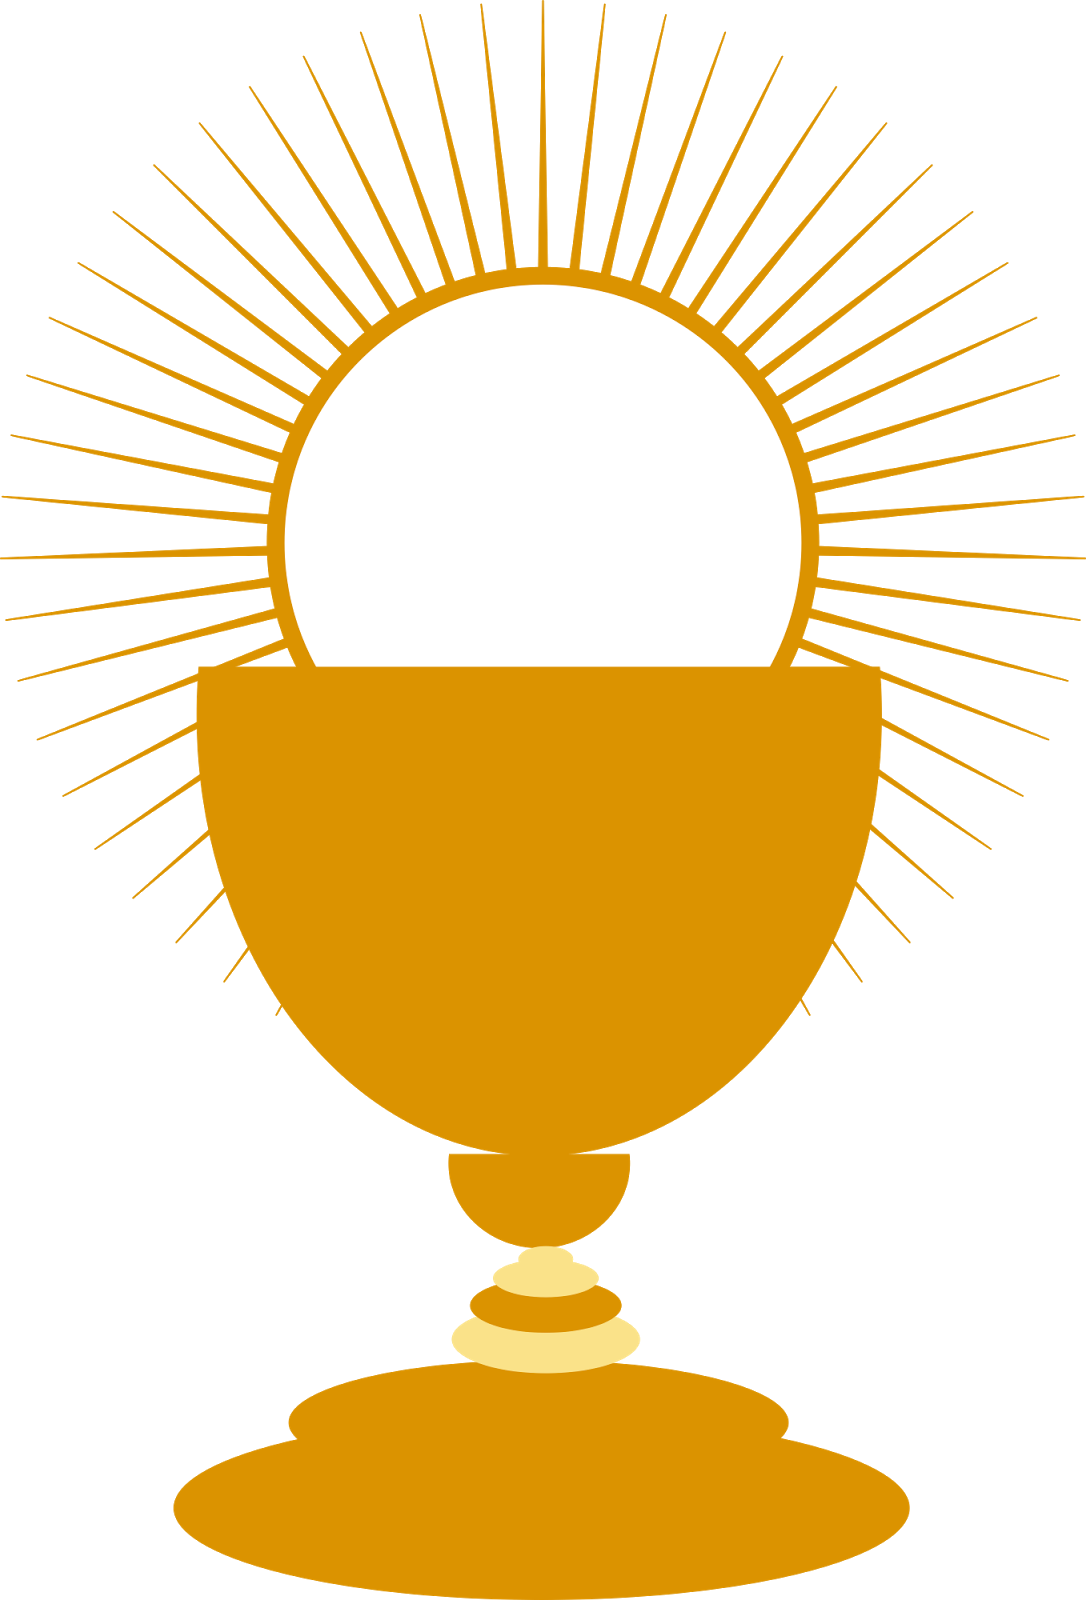 De nenas en su. Communion clipart communion wafer